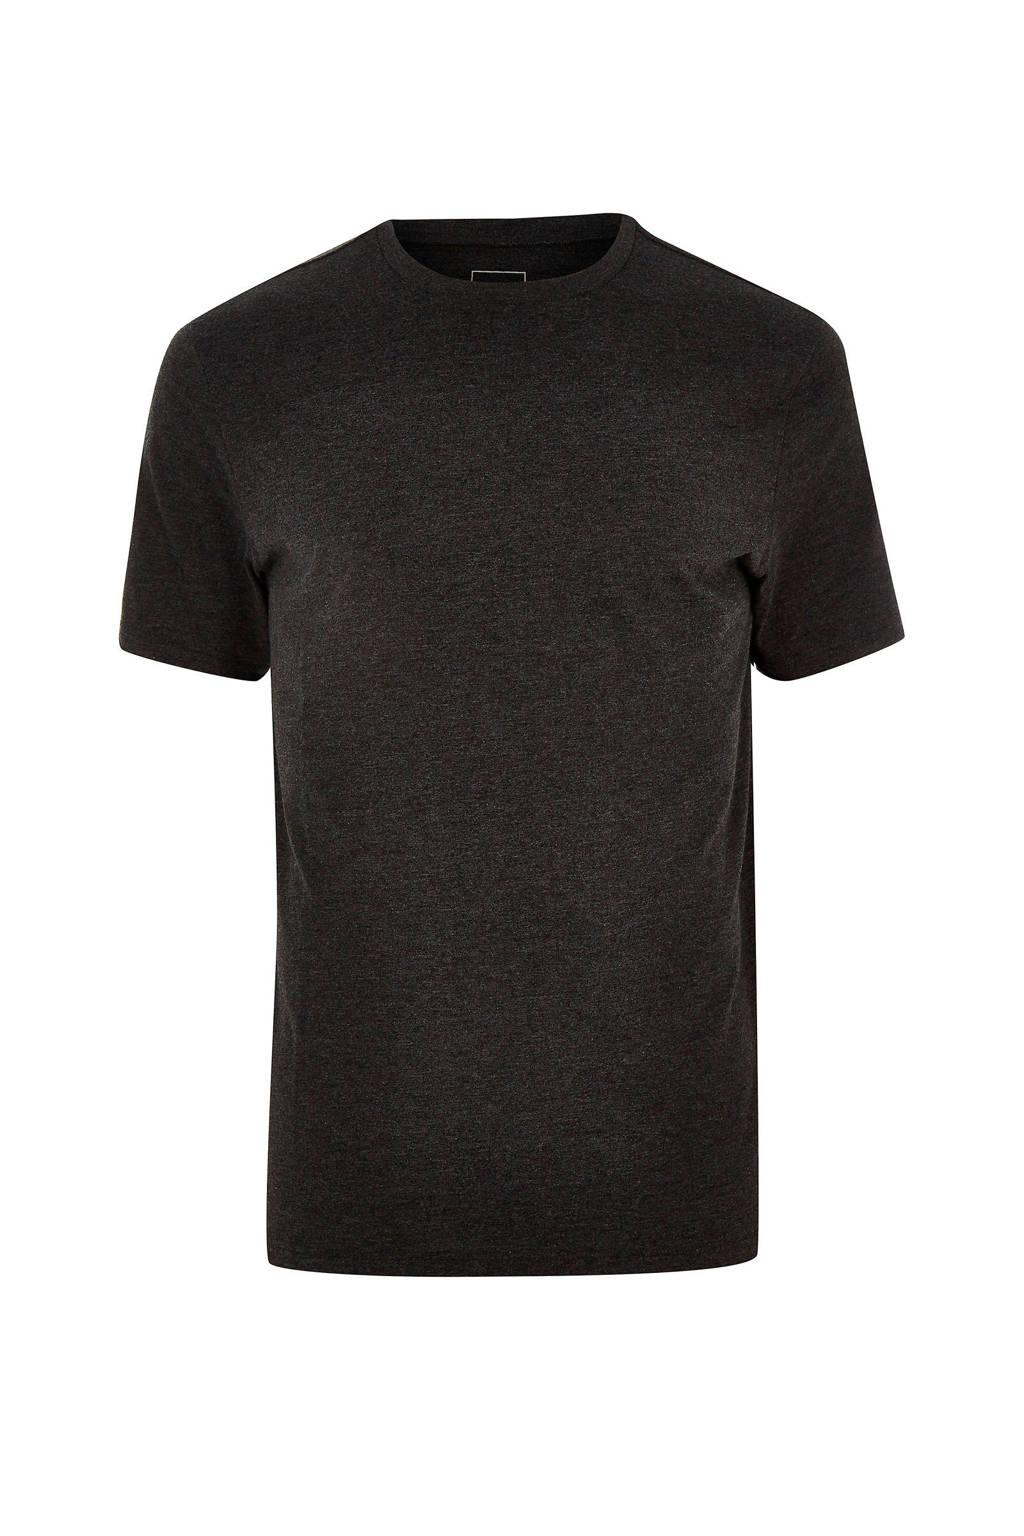 River Island T-shirt basic, Donkergrijs